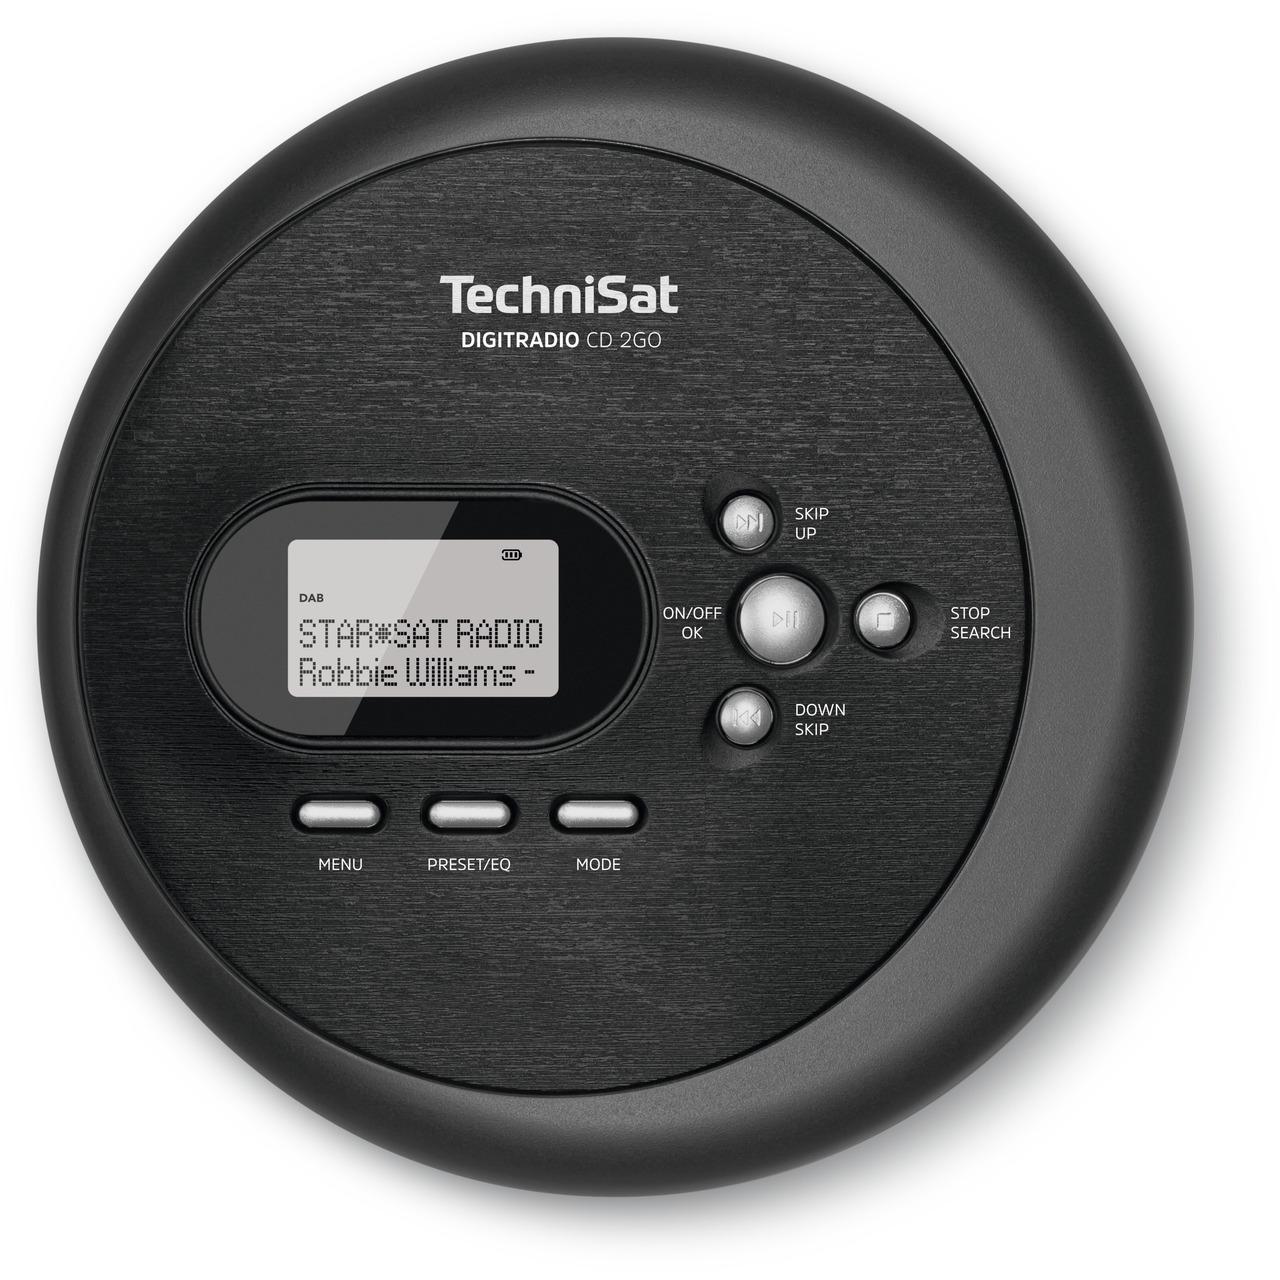 TechniSat Portabler CD-Player DIGITRADIO CD 2GO- mit DAB+ und UKW-Radio- inkl- Kopfhörer